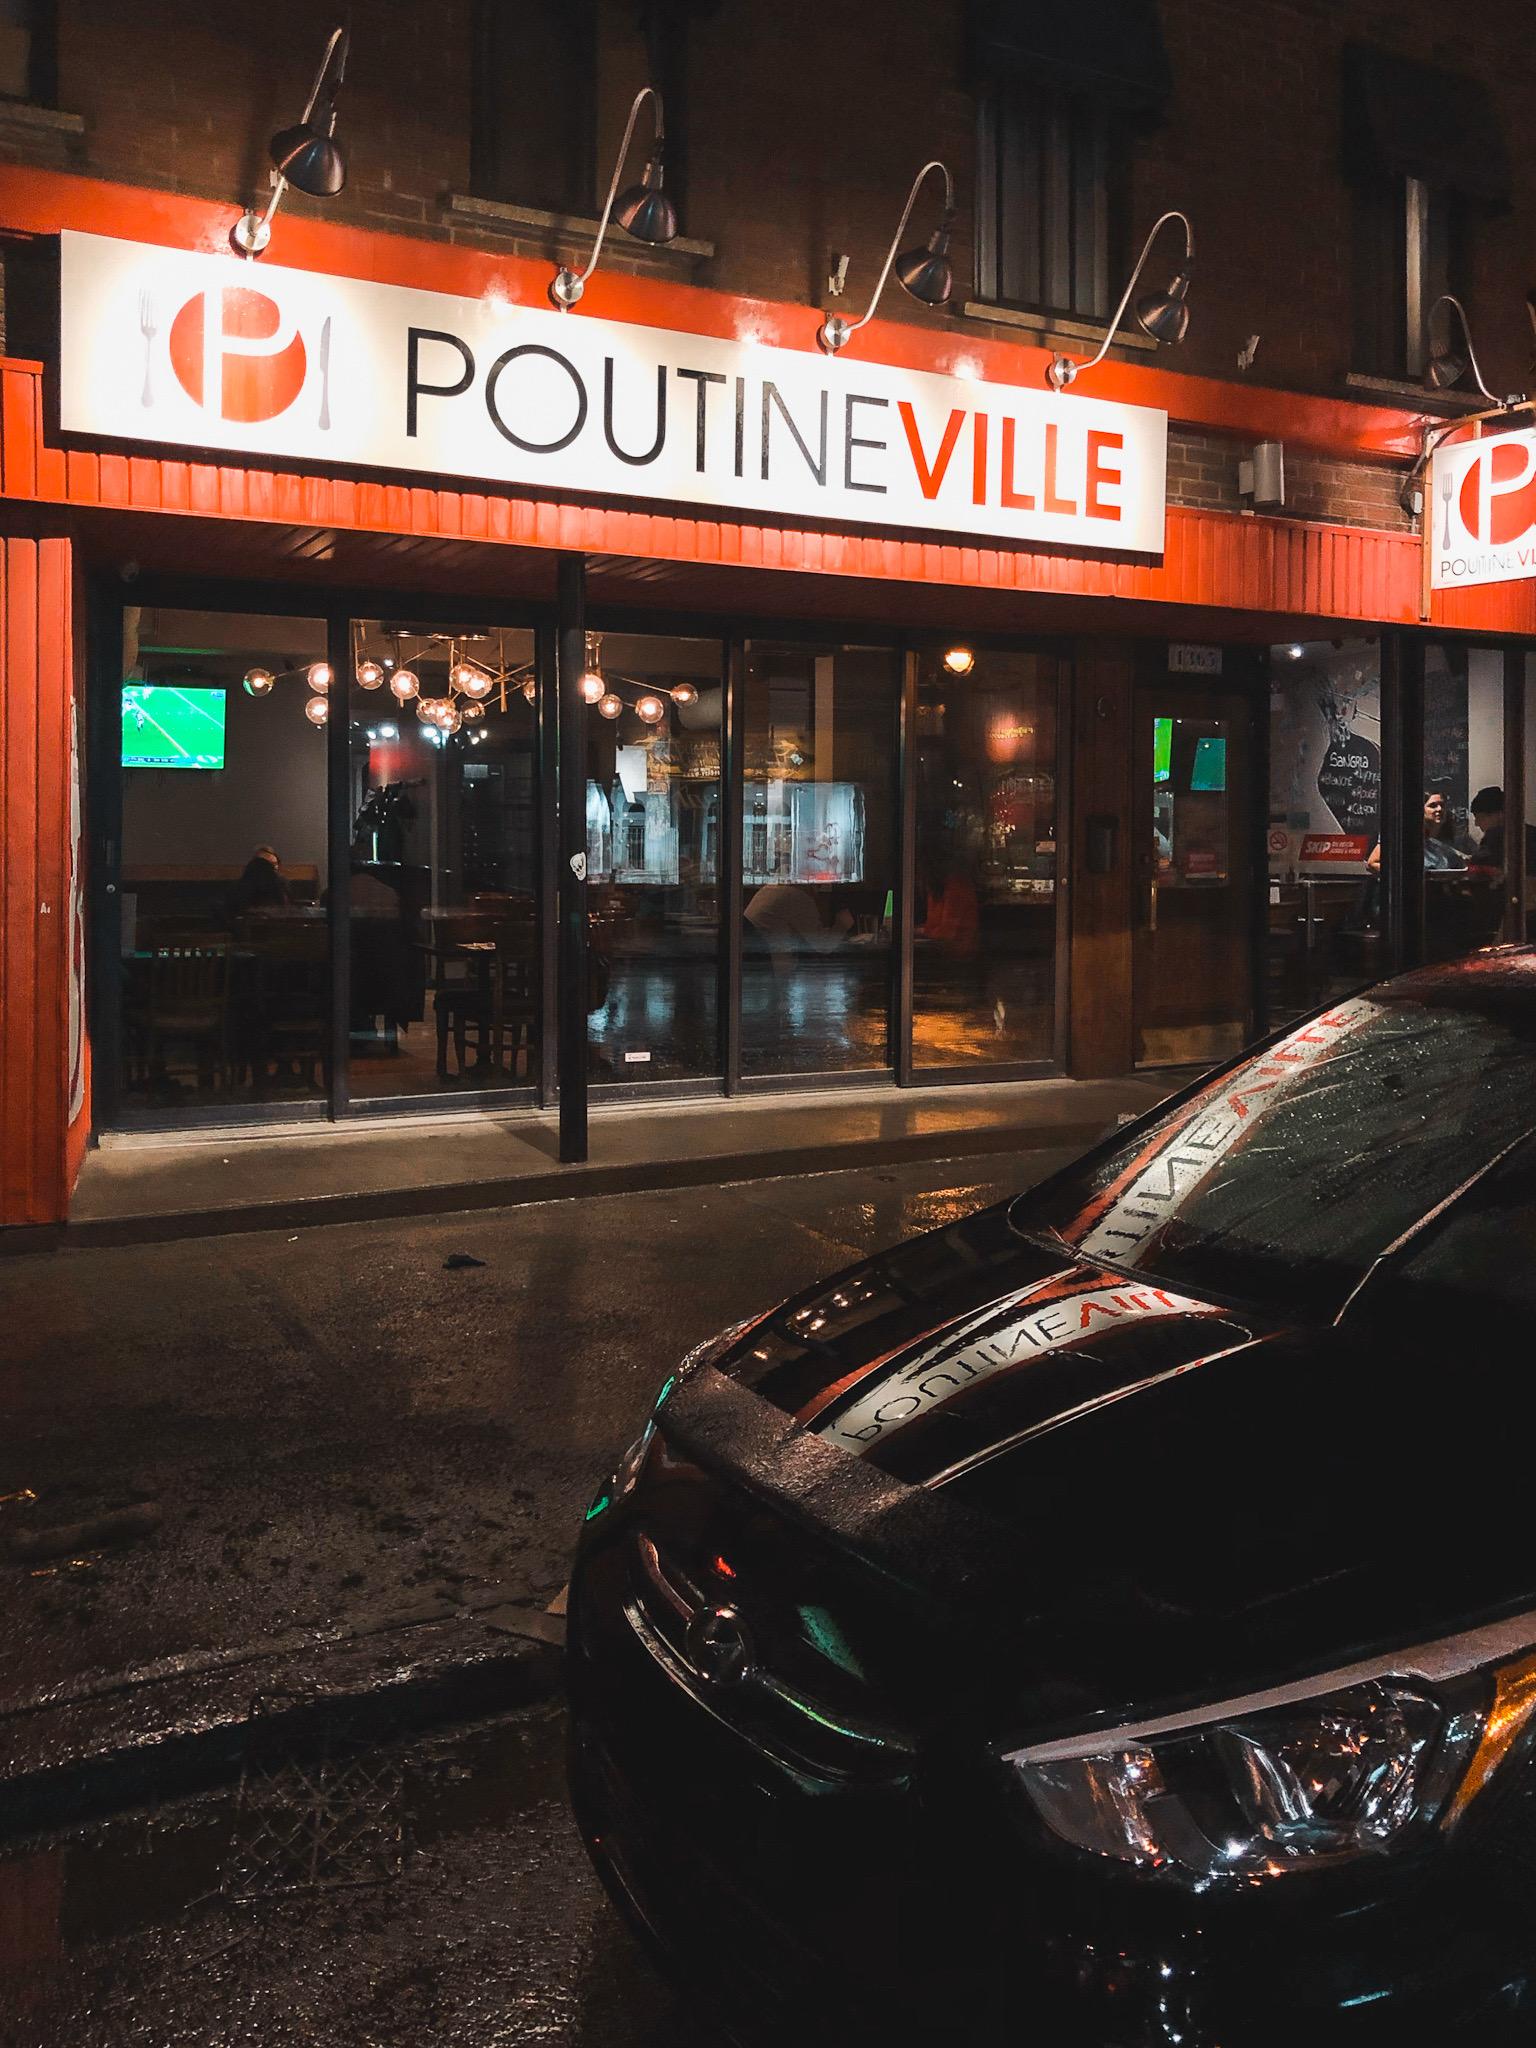 Restaurant Poutineville Montreal